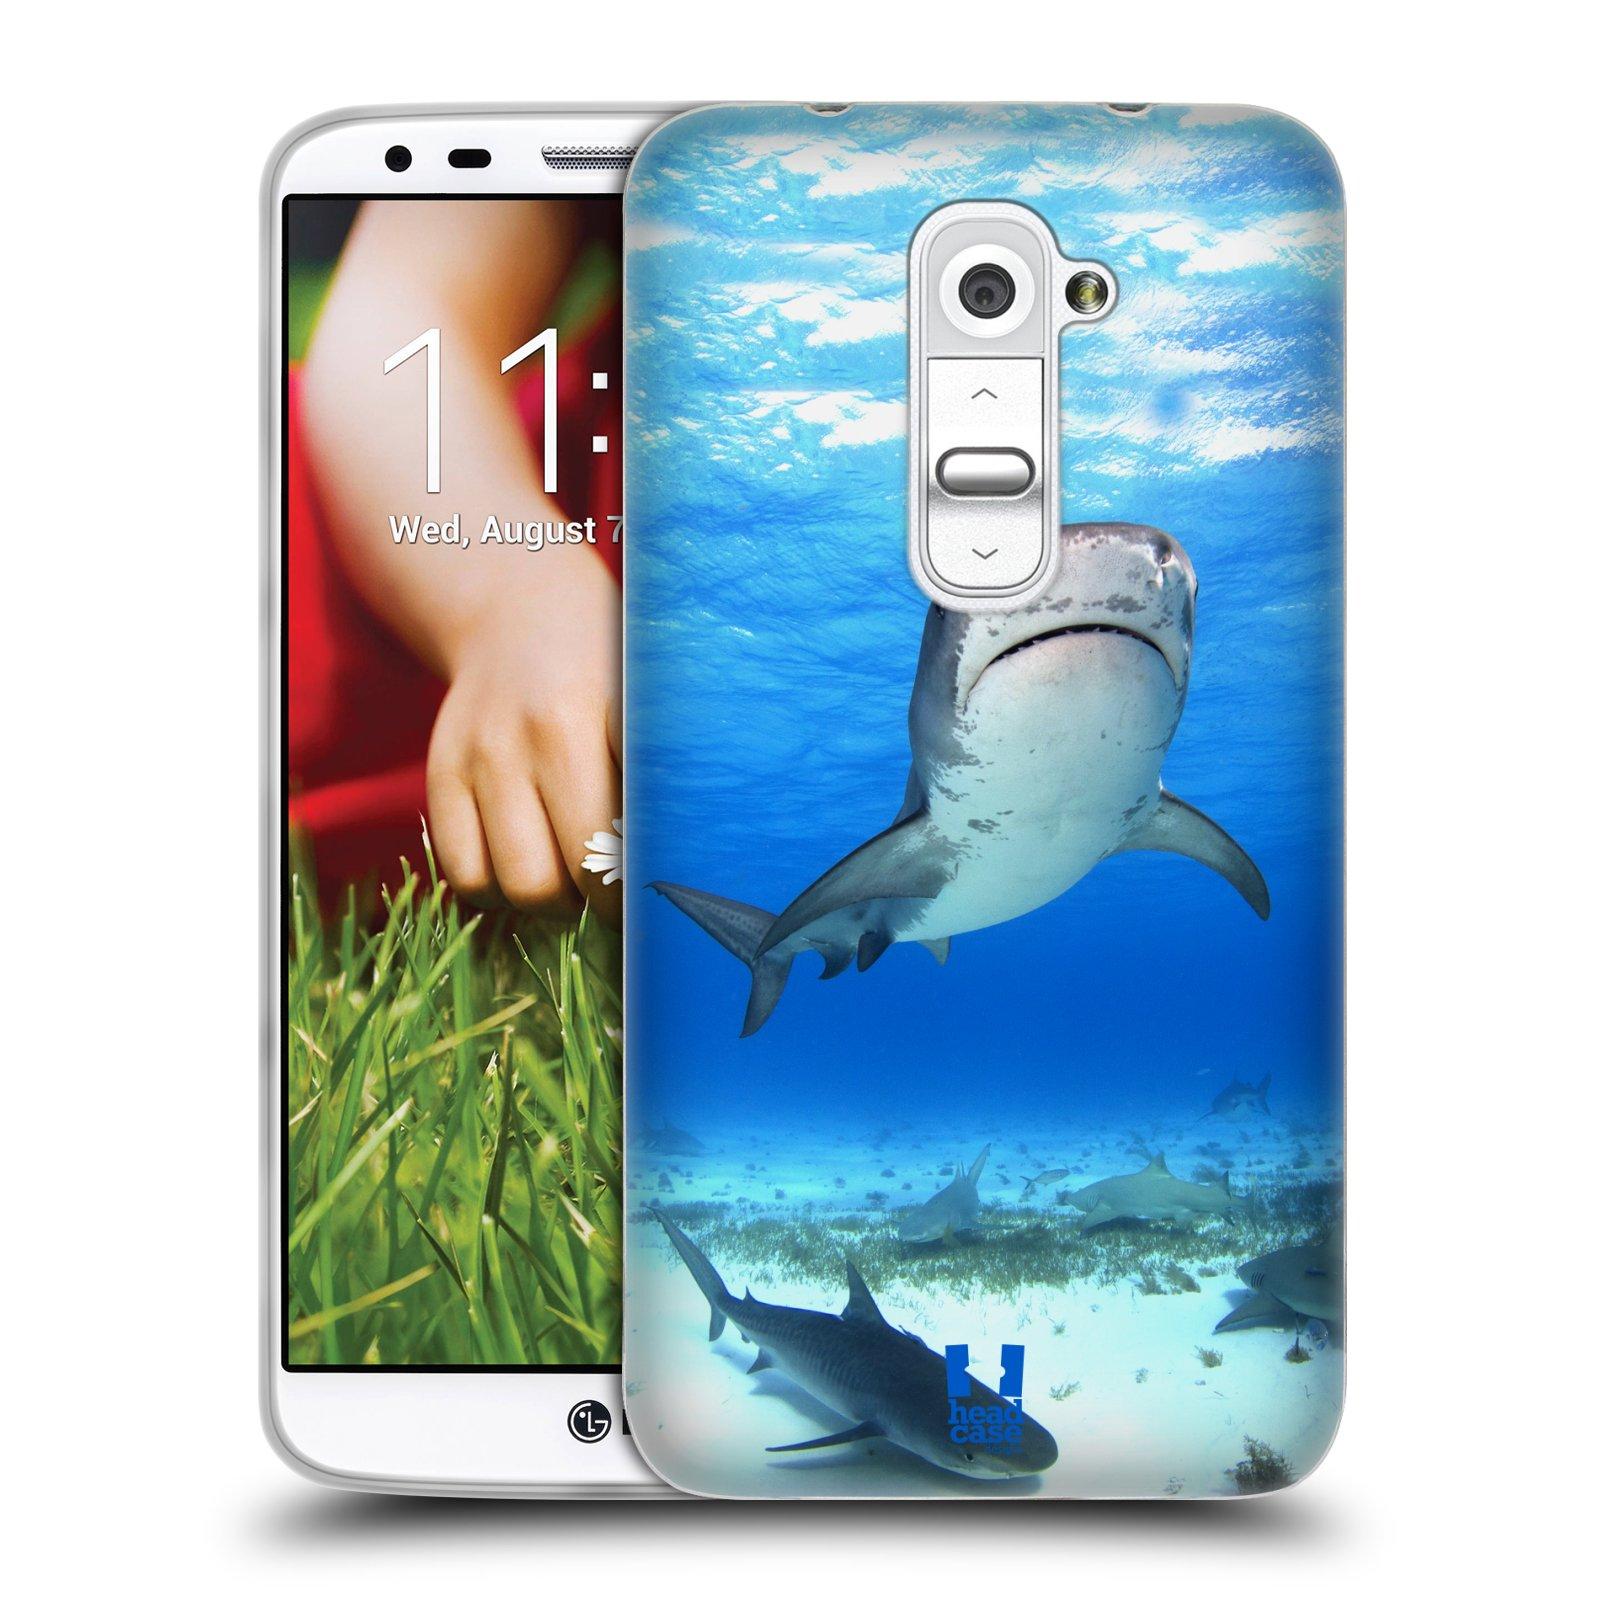 HEAD CASE silikonový obal na mobil LG G2 vzor slavná zvířata foto žralok tygří